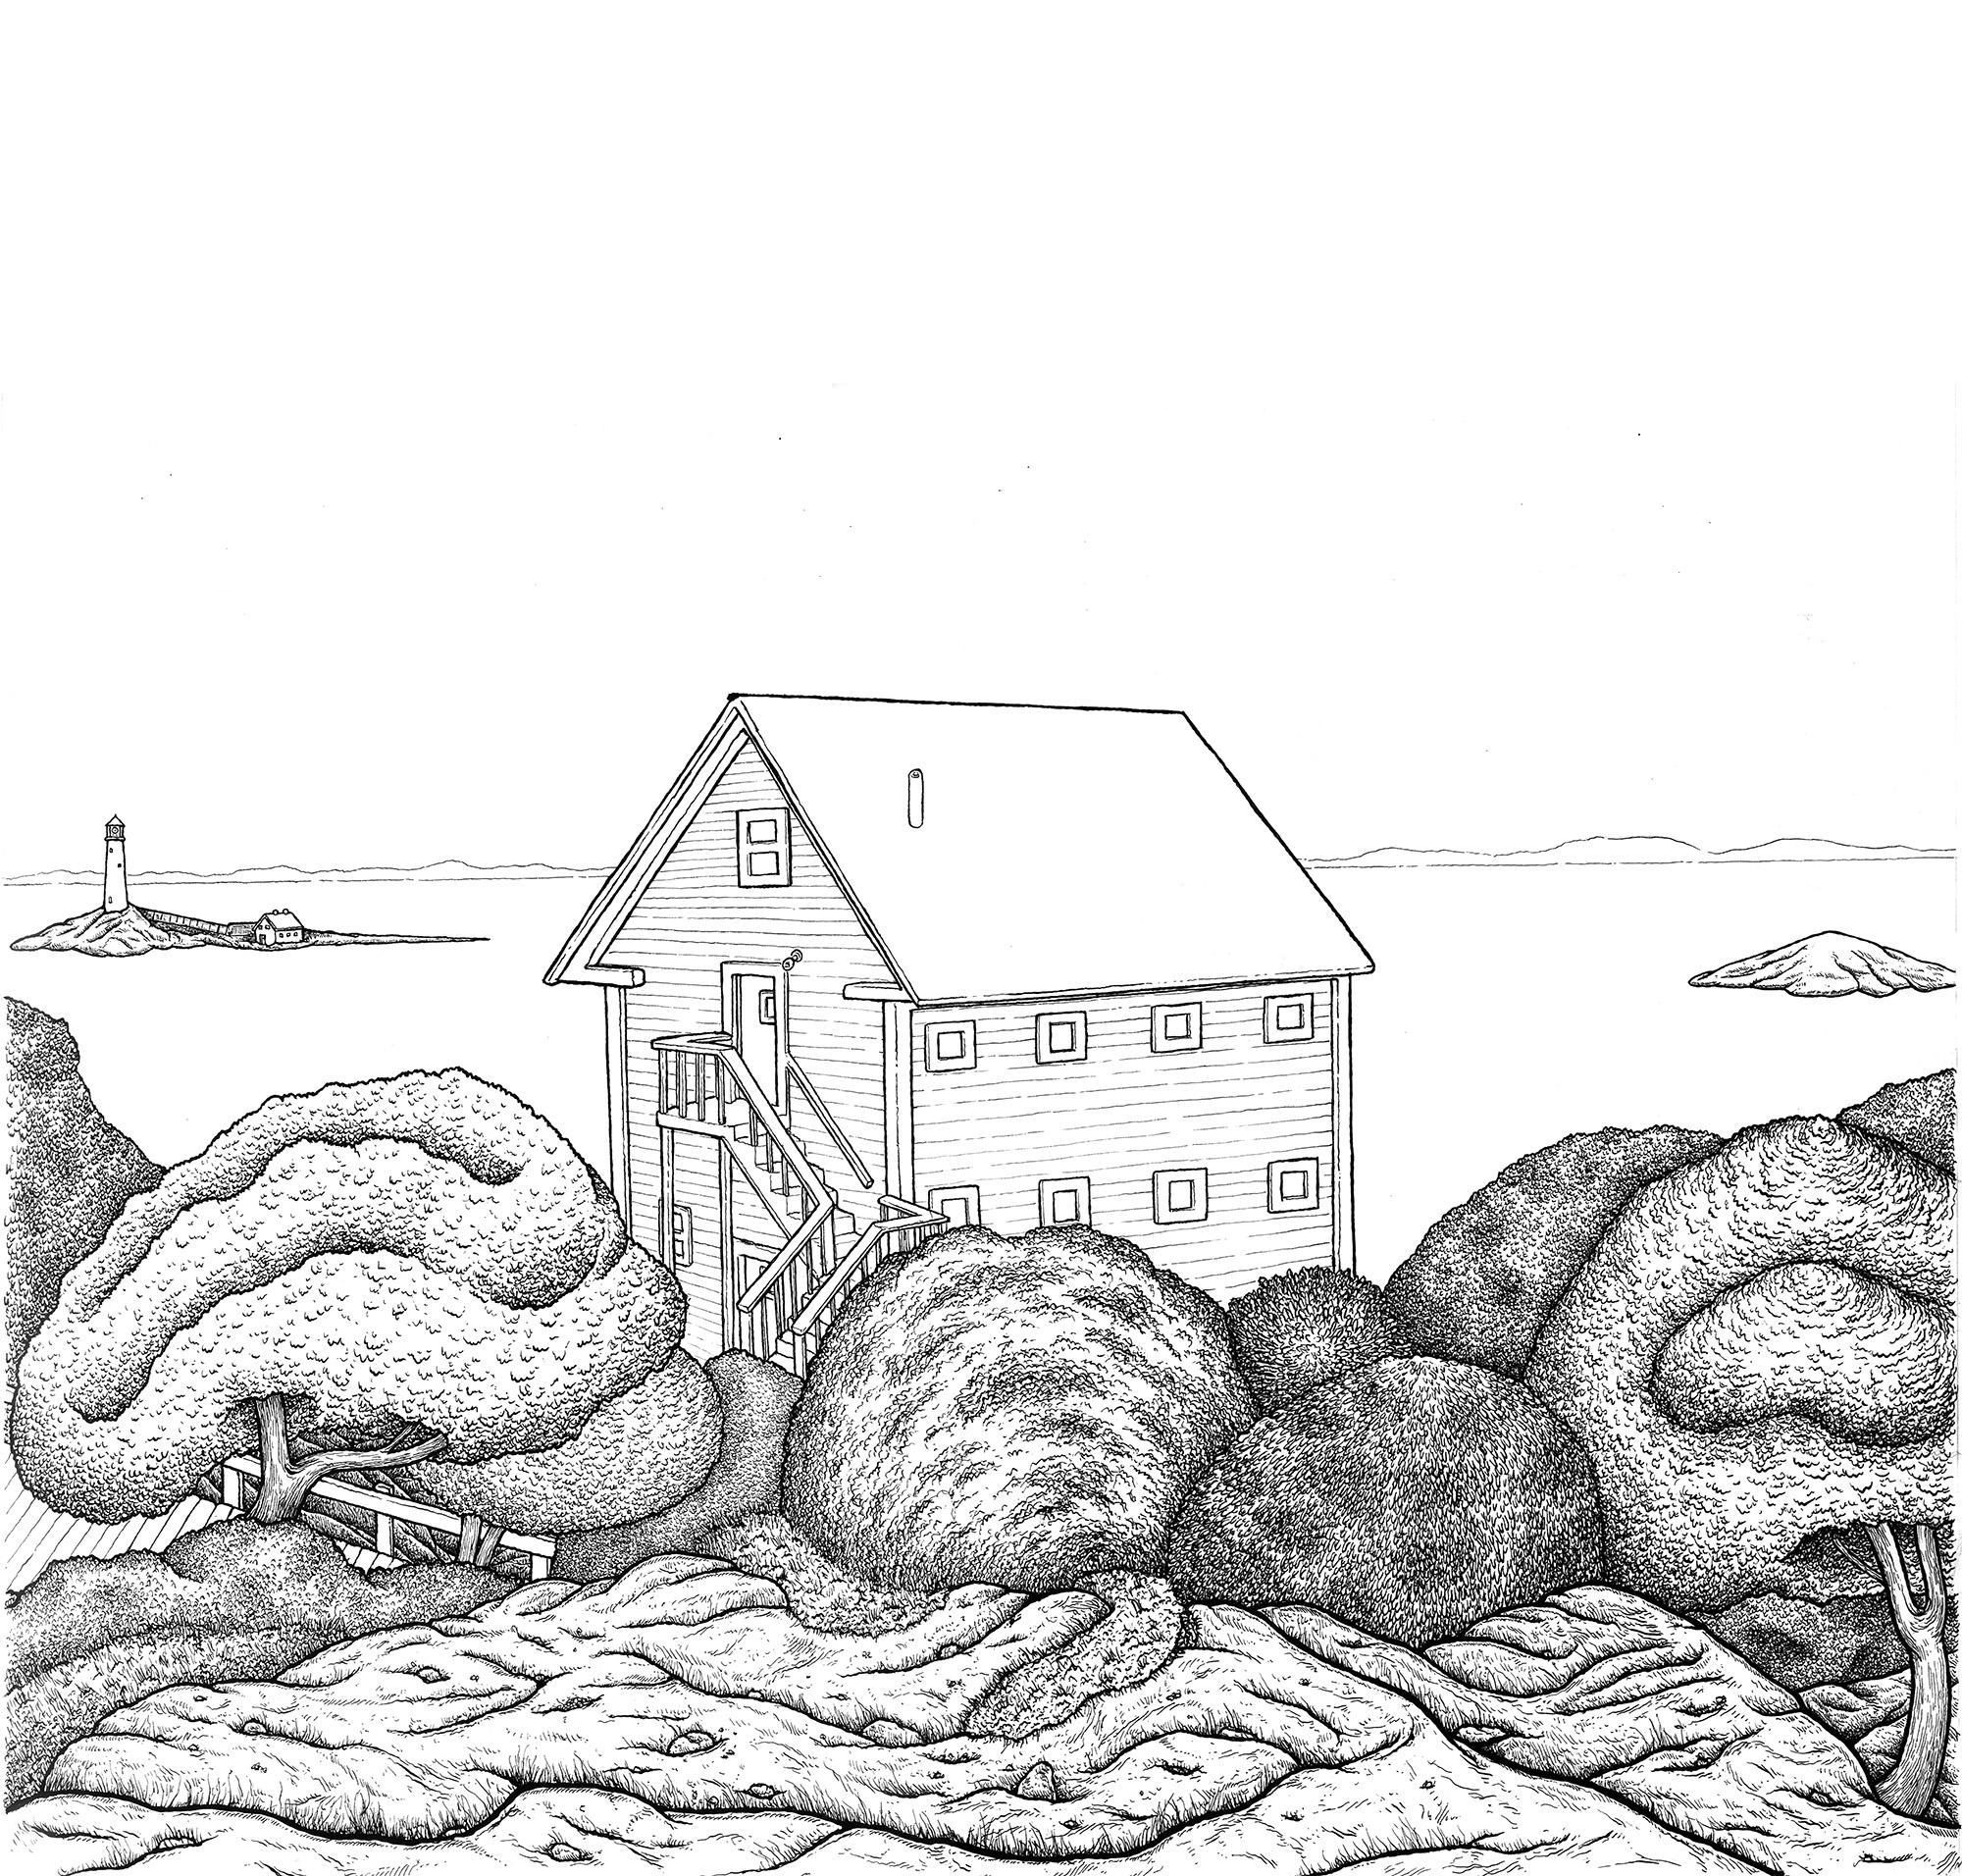 pell+house+ink+web.jpg